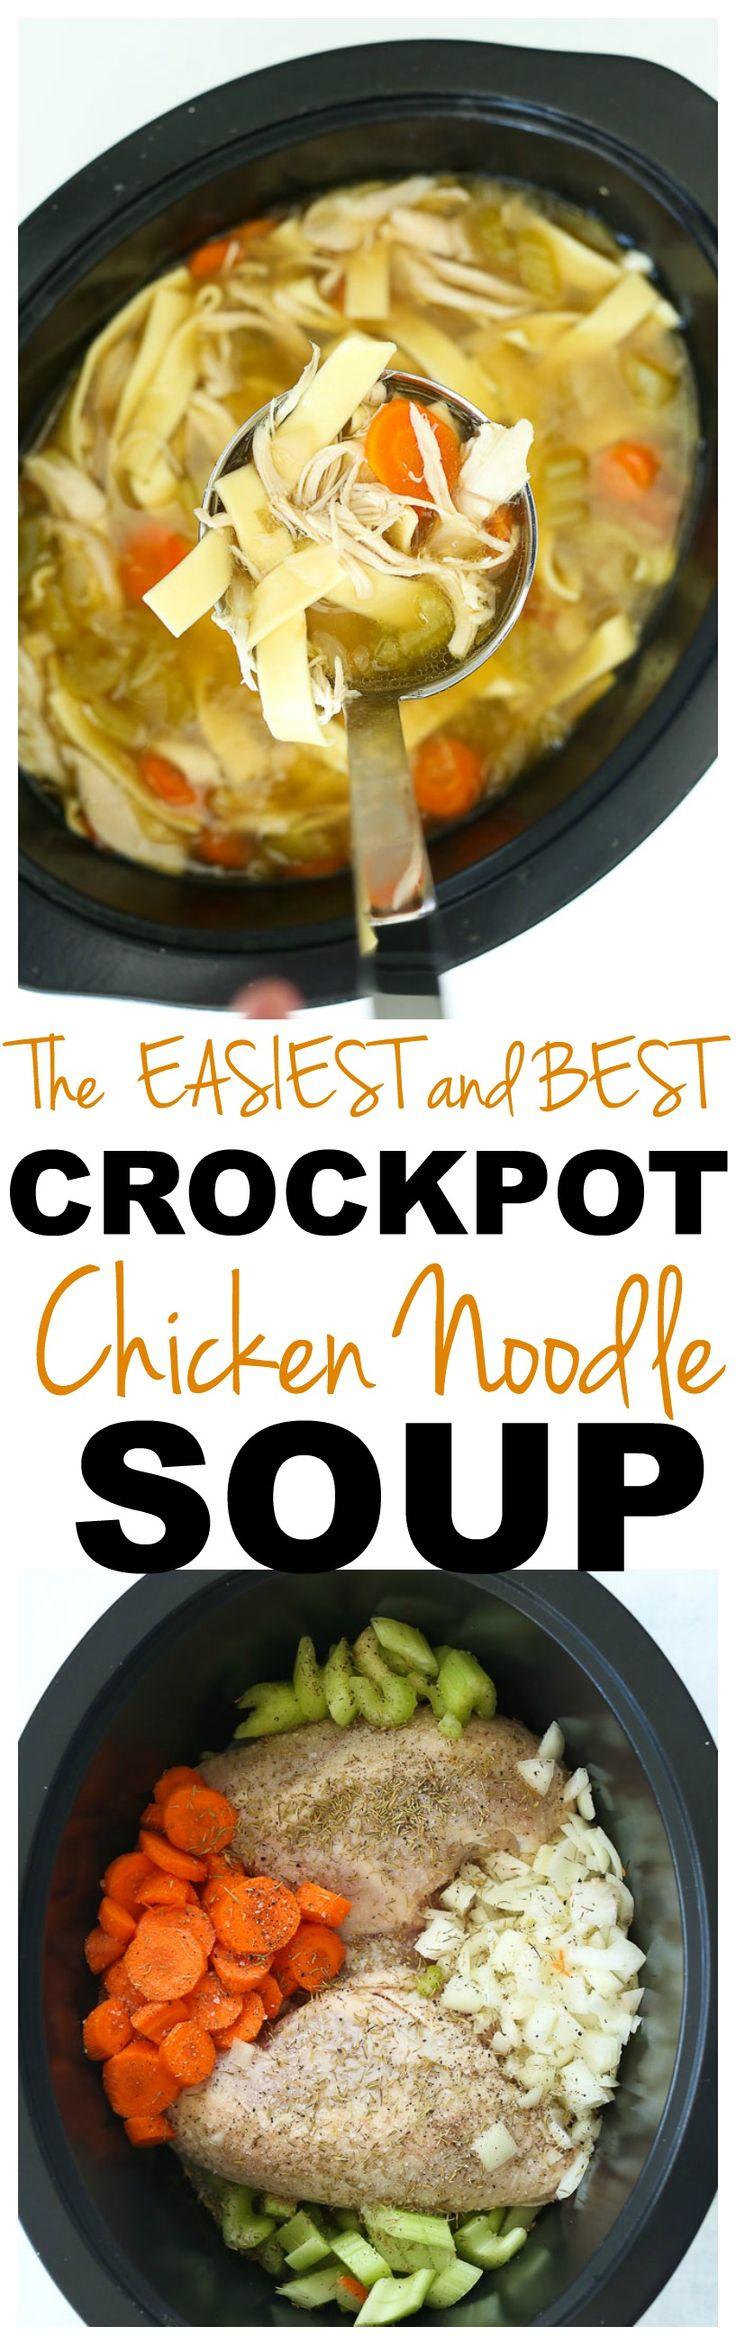 Crockpot Chicken Noodle Soup recipe #crockpot #chicken #easy #recipes #healthy  #weeknightdinner #soup via @Maryea Flaherty